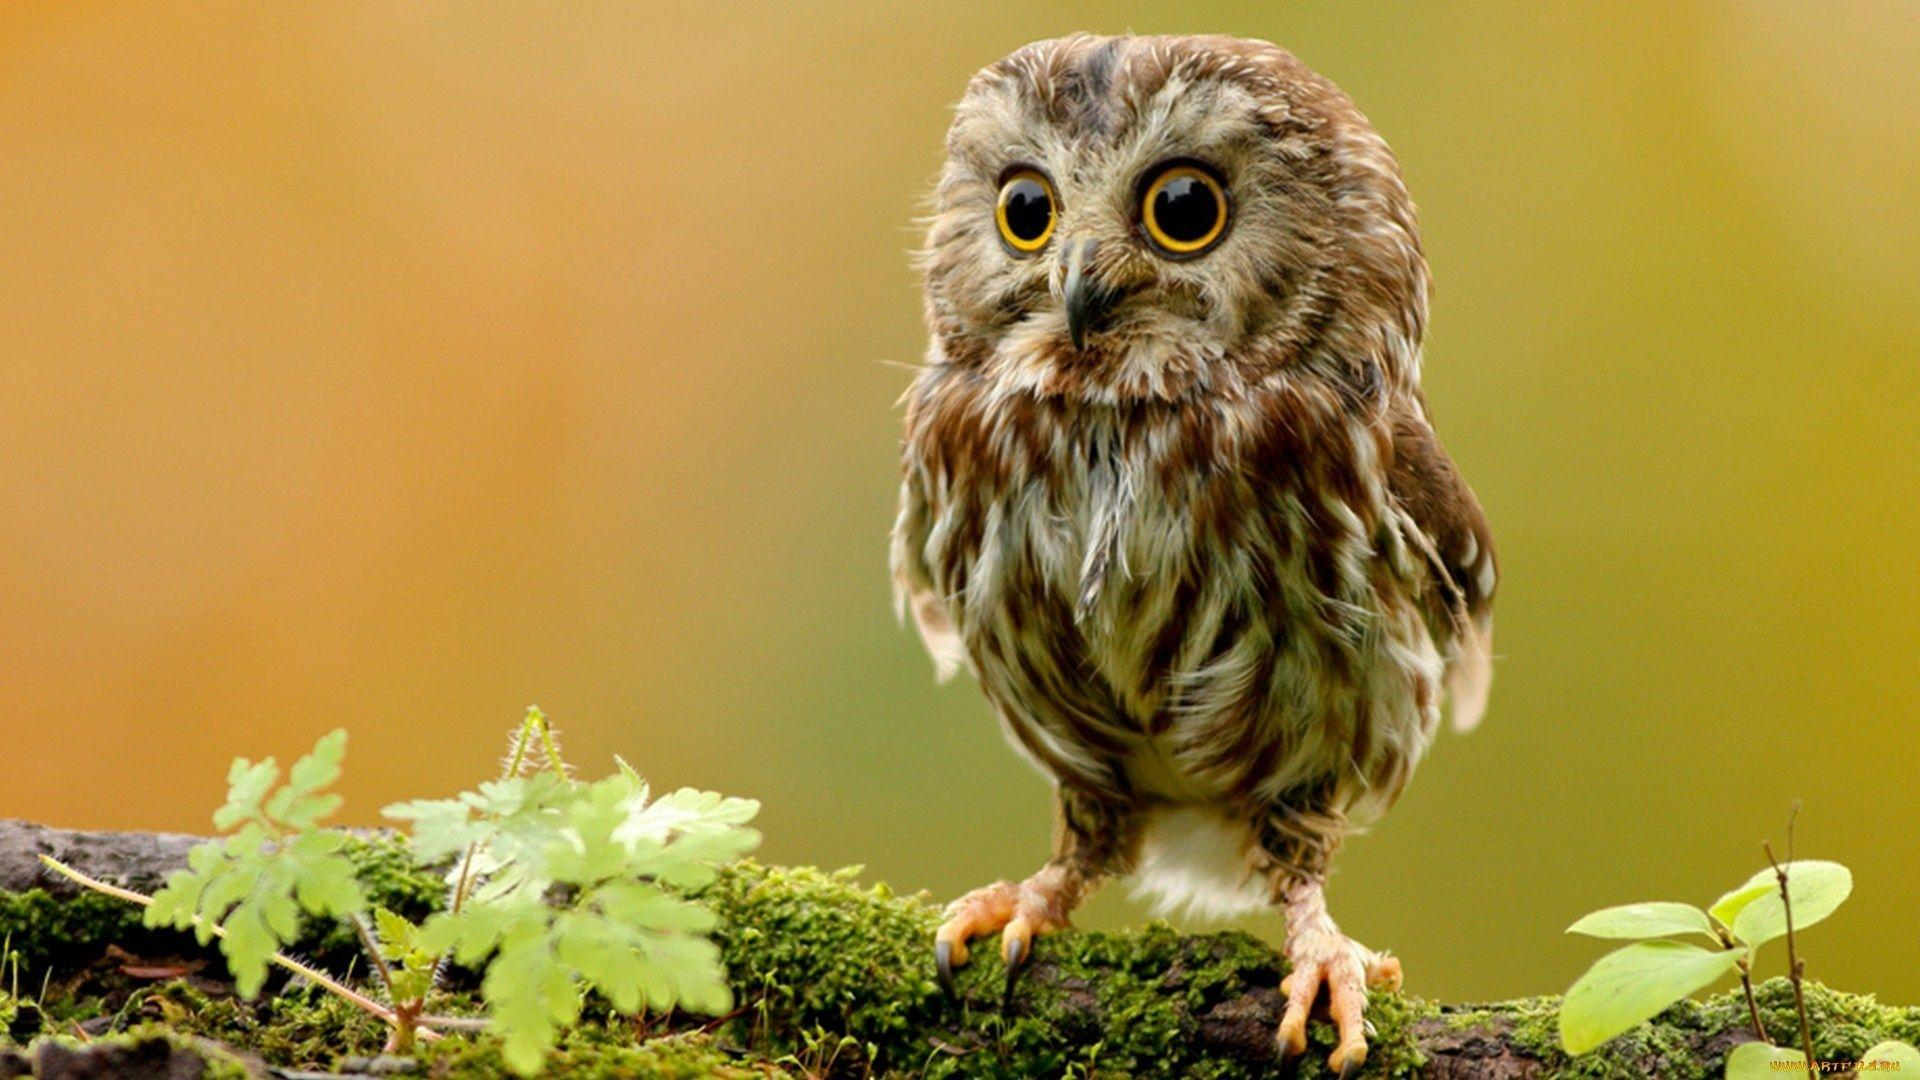 Owls wallpapers wallpaper cave owls wallpapers reuun voltagebd Images